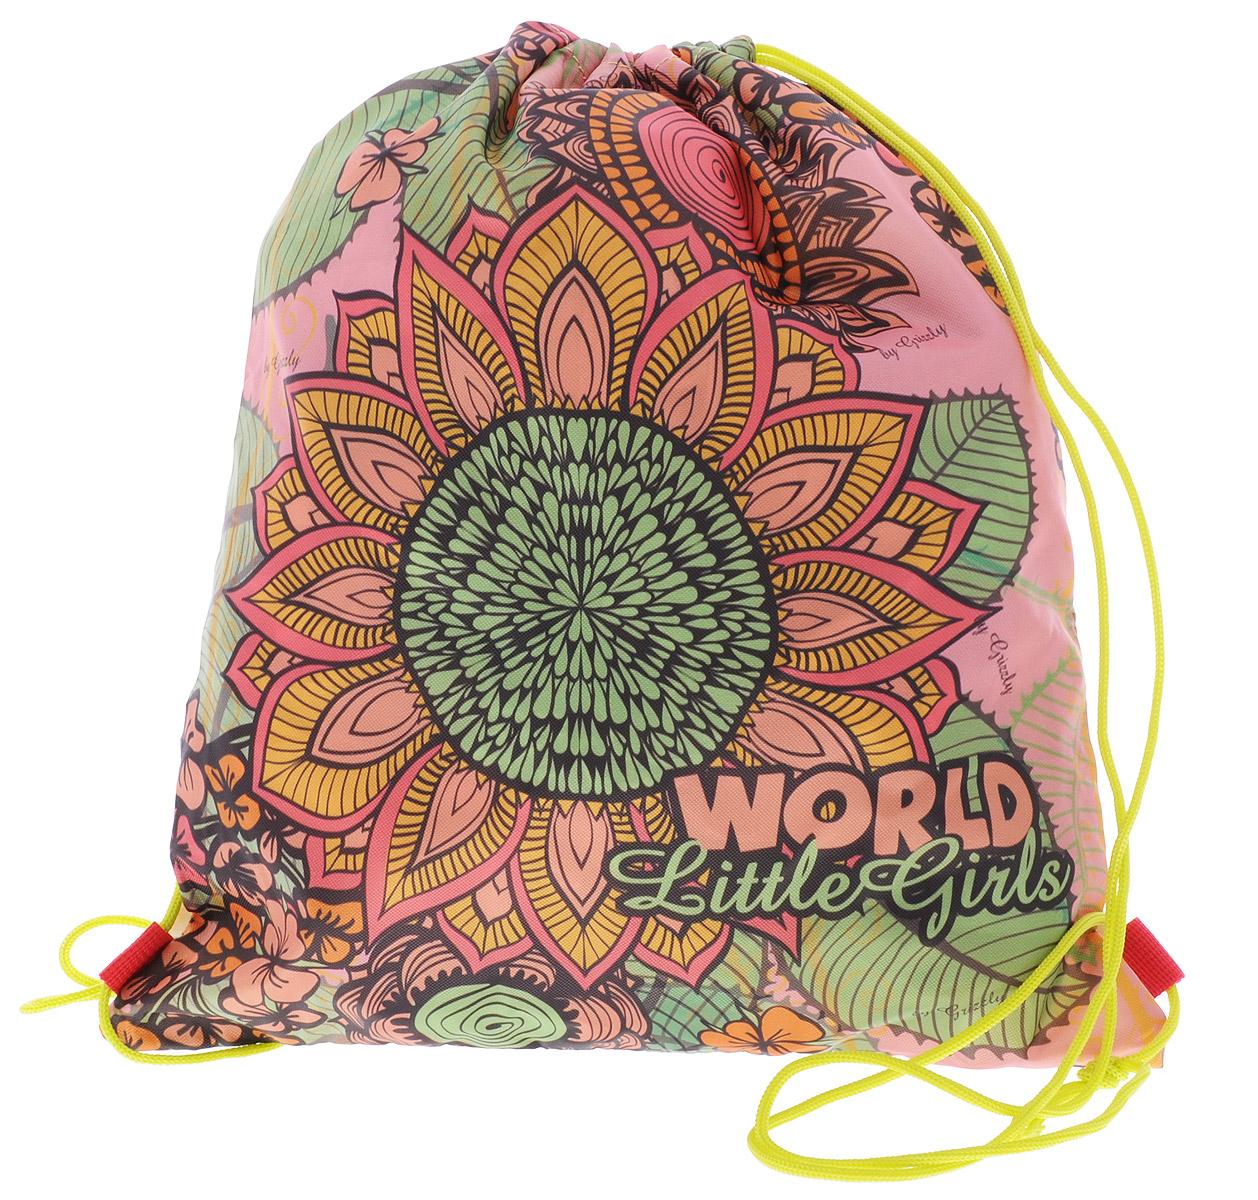 Grizzly Мешок для обуви World Little Girls цвет бежевый розовый зеленый мешки для обуви grizzly om 677 мешок для обуви